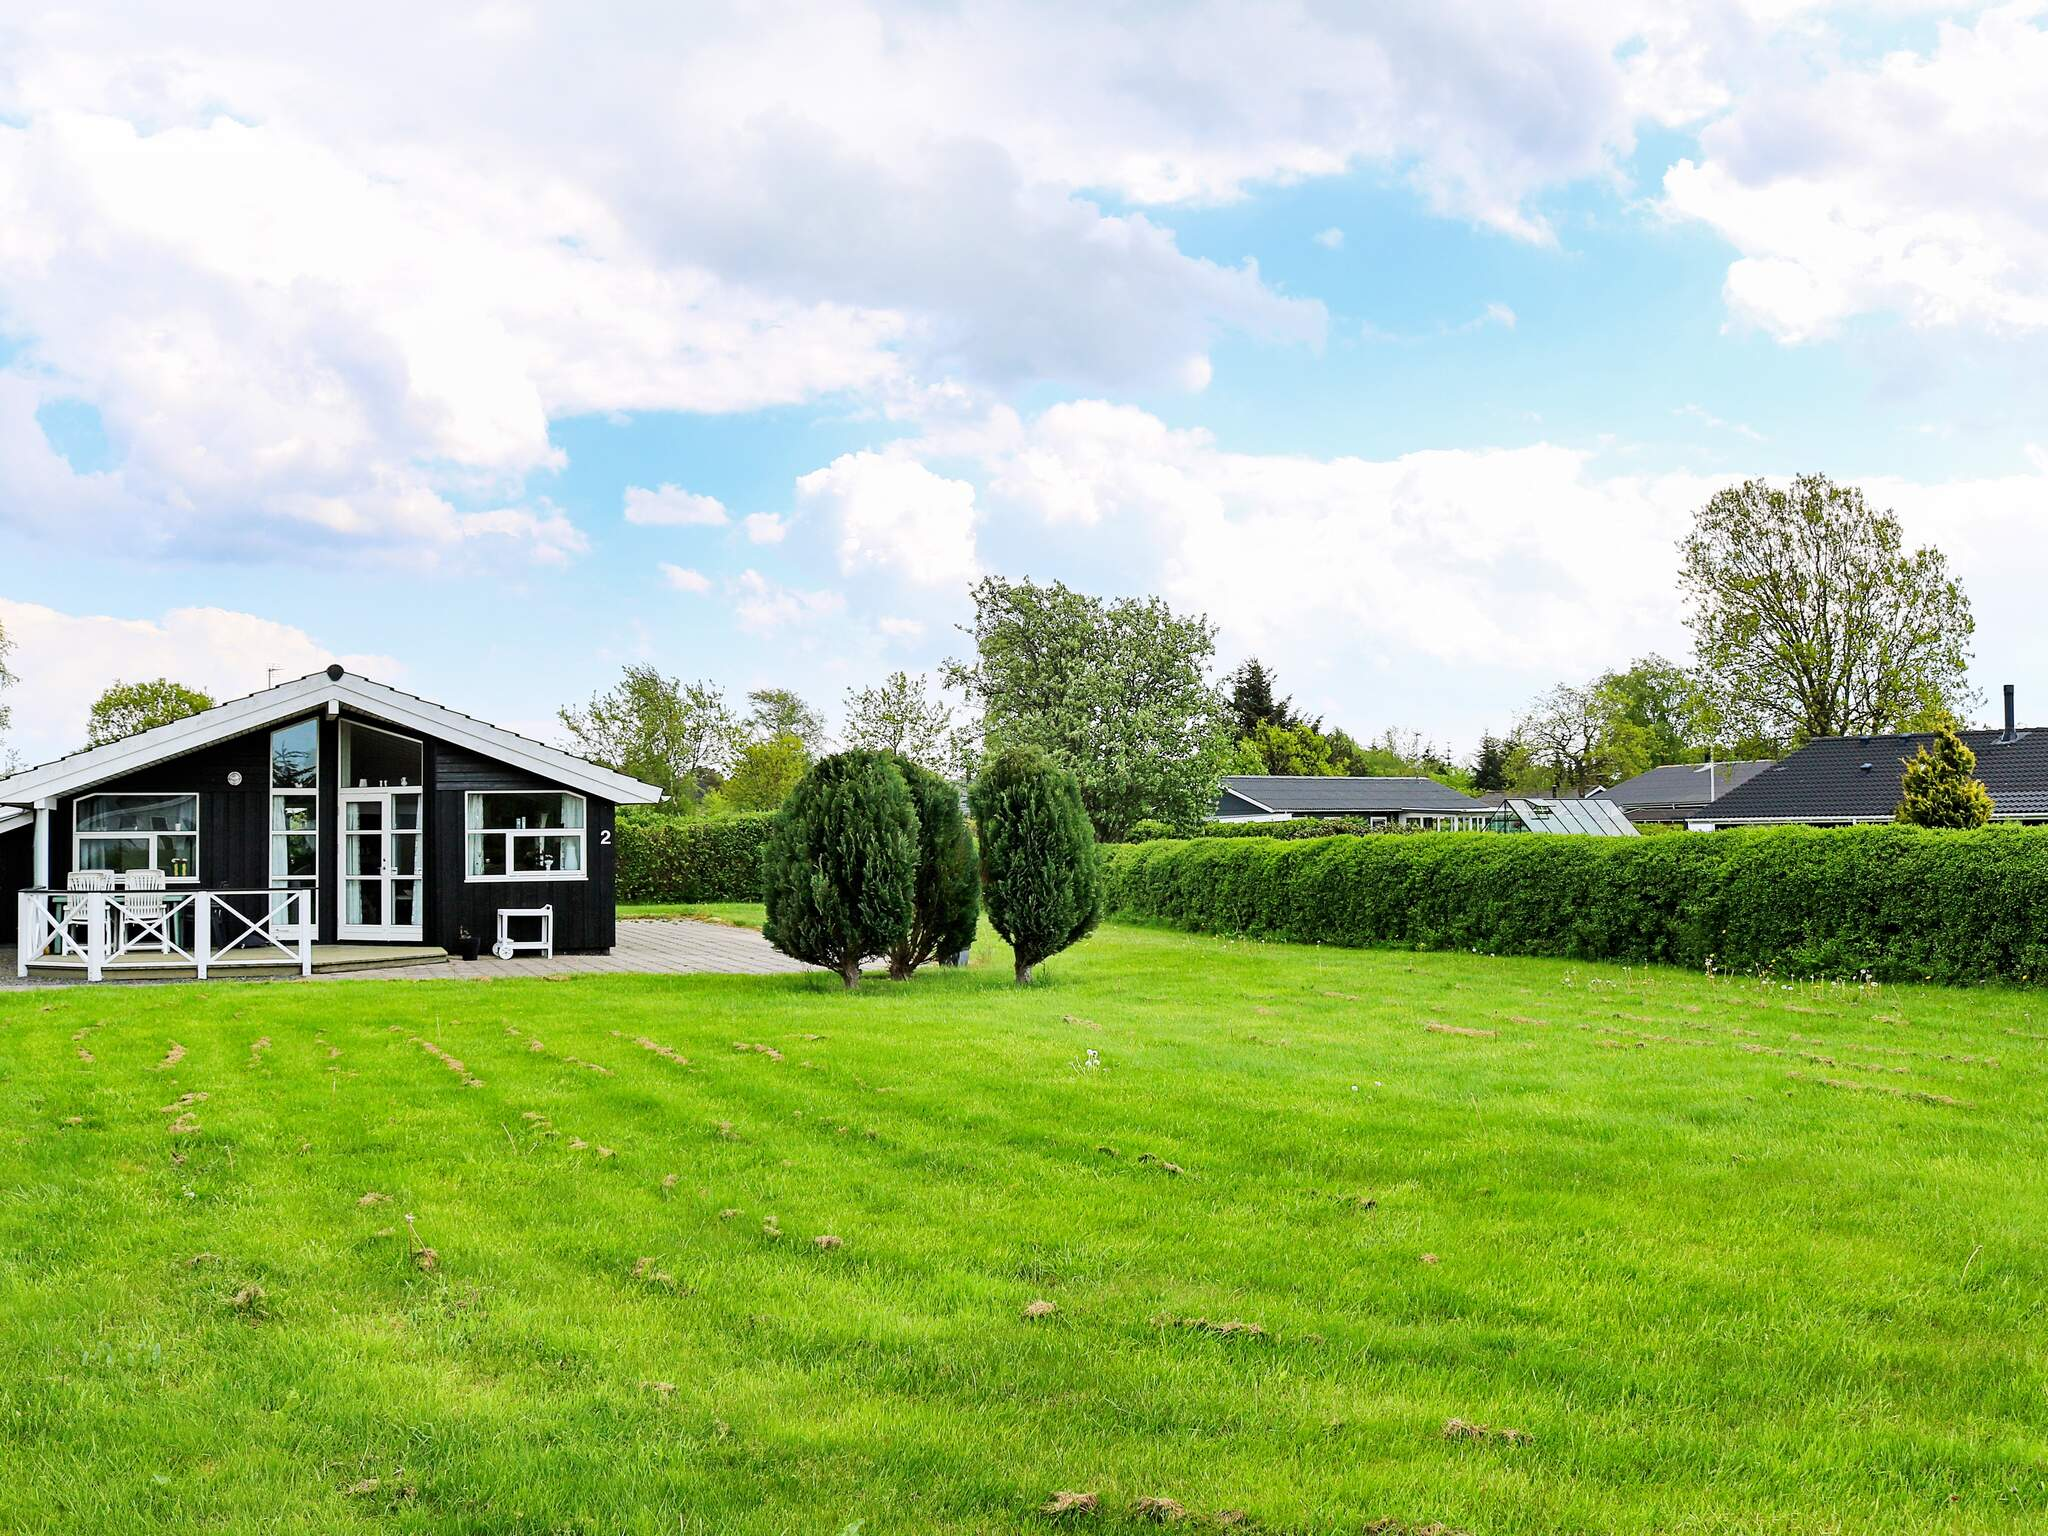 Ferienhaus Øster Hurup (480896), Øster Hurup, , Dänische Ostsee, Dänemark, Bild 1